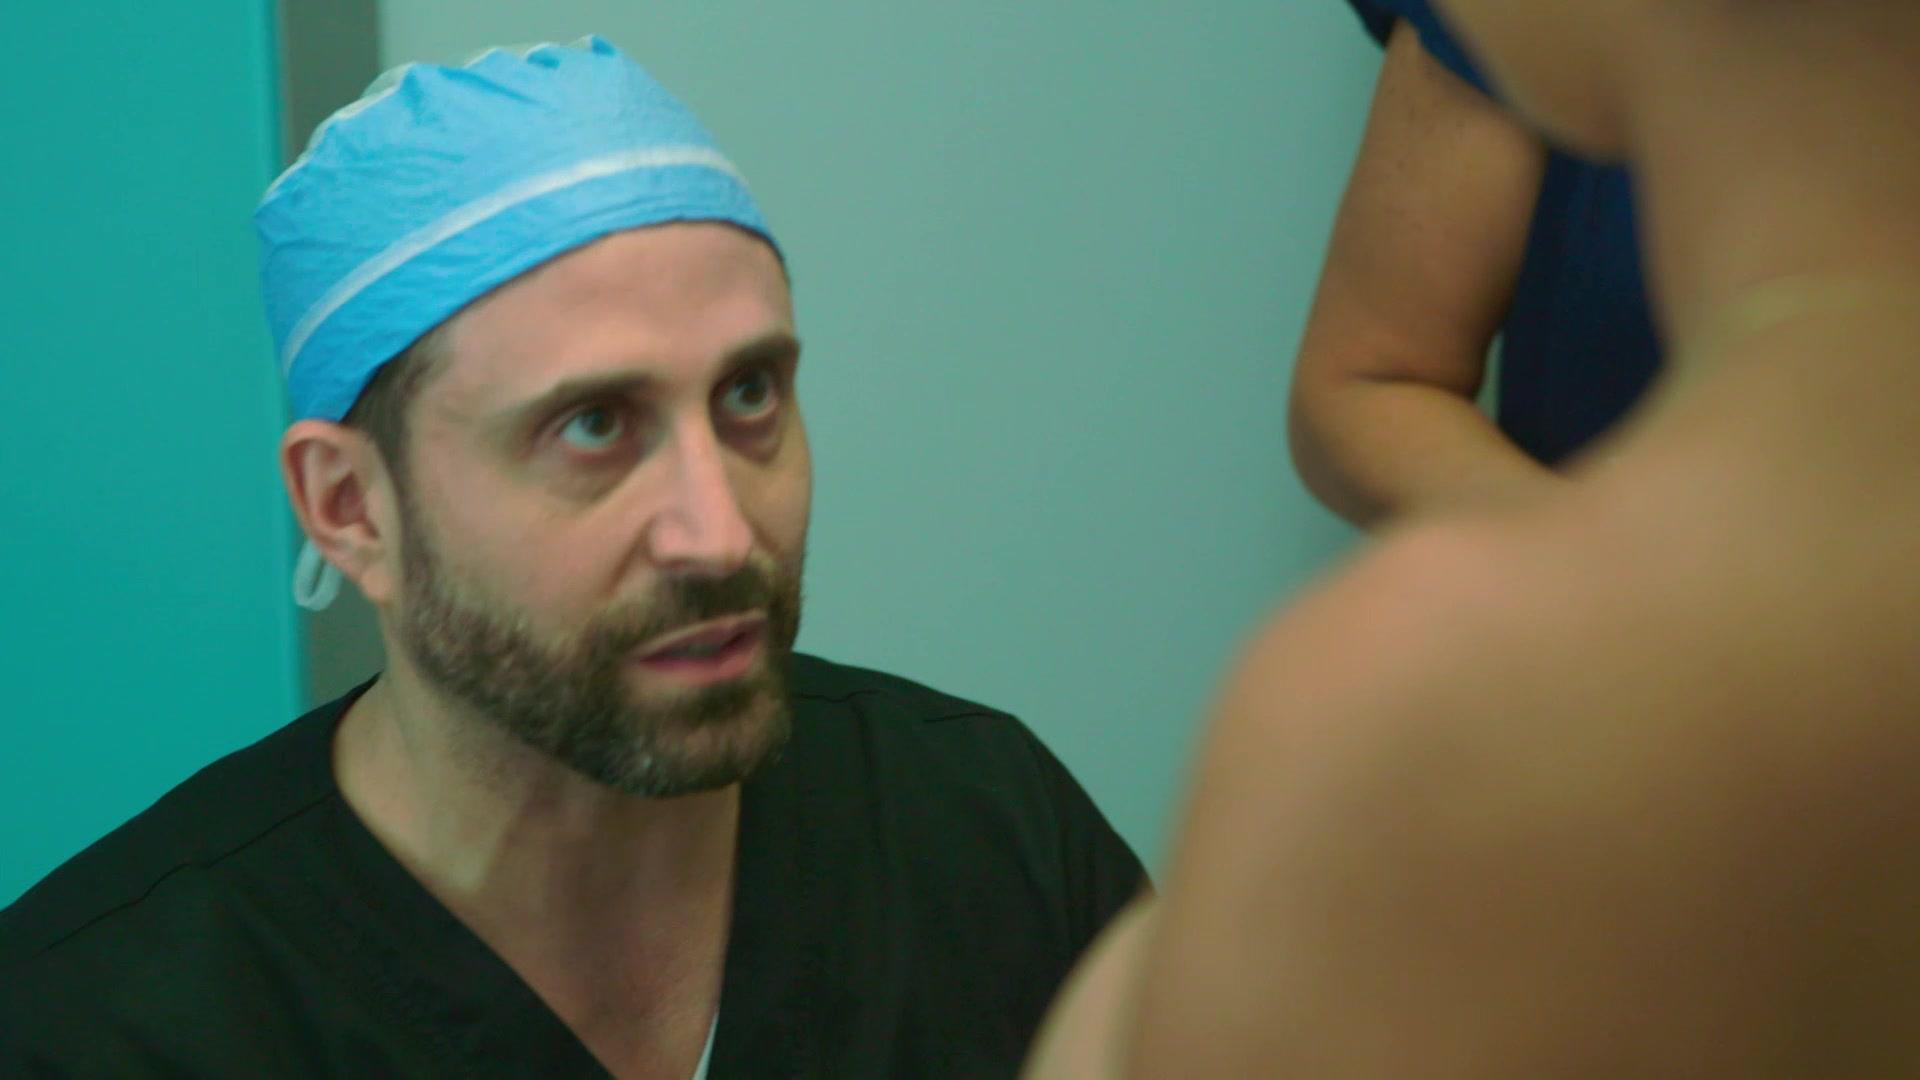 Girls Gone Wild 50 Best Breasts for dr. miami – bad girls gone wild sneak peek – we tv